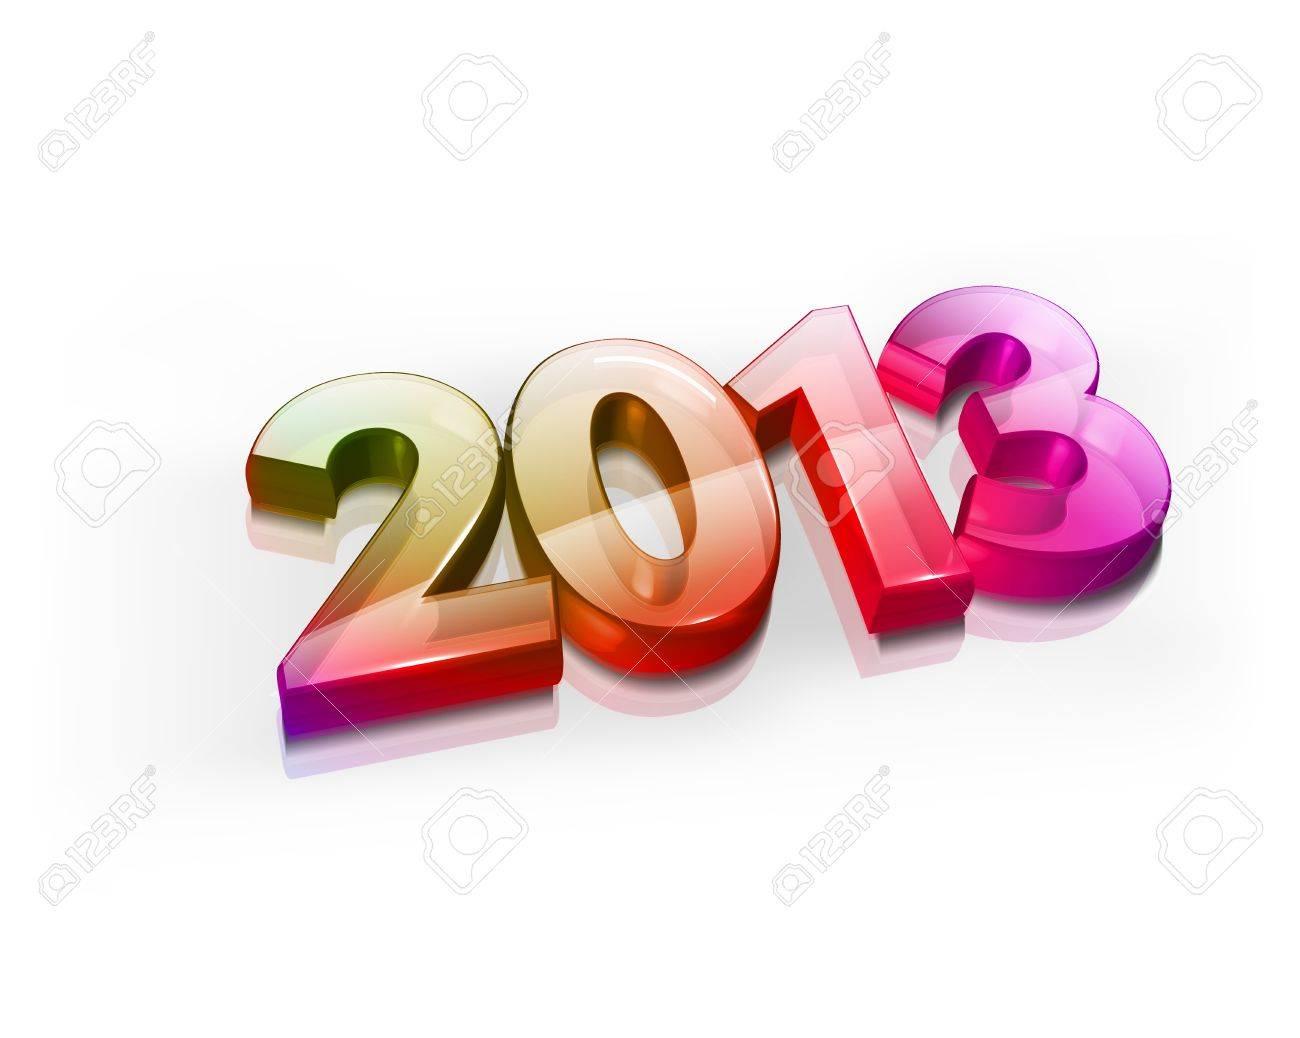 3d Happy new year 2013 celebration illustration design. Stock Vector - 16819091